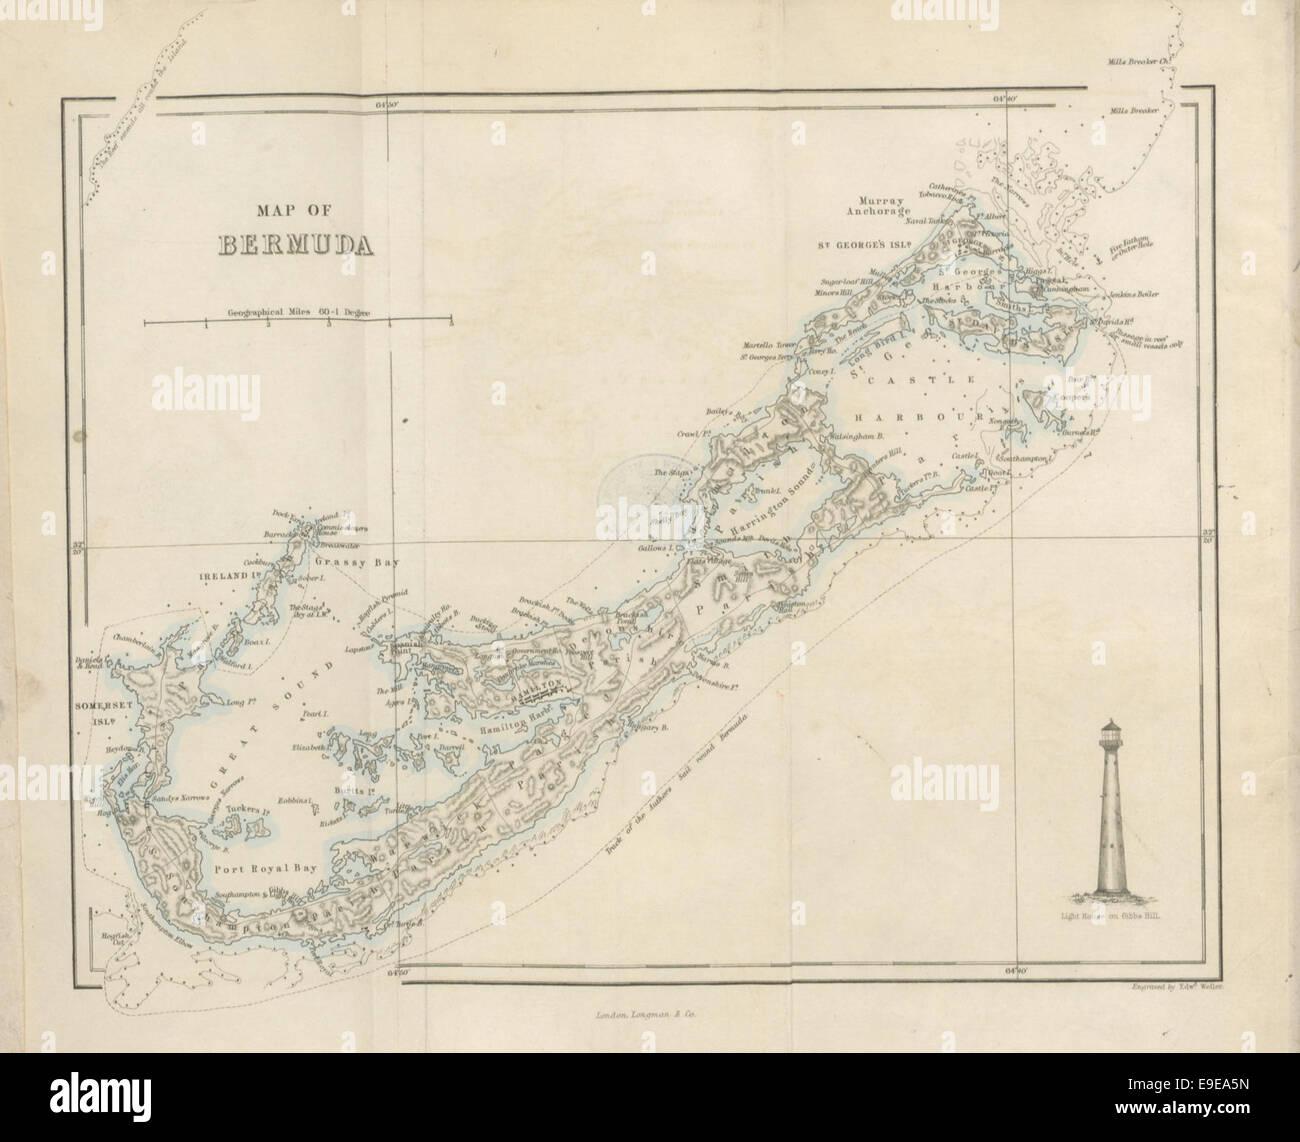 Vintage Map Of Bermuda Stock Photos & Vintage Map Of Bermuda Stock ...